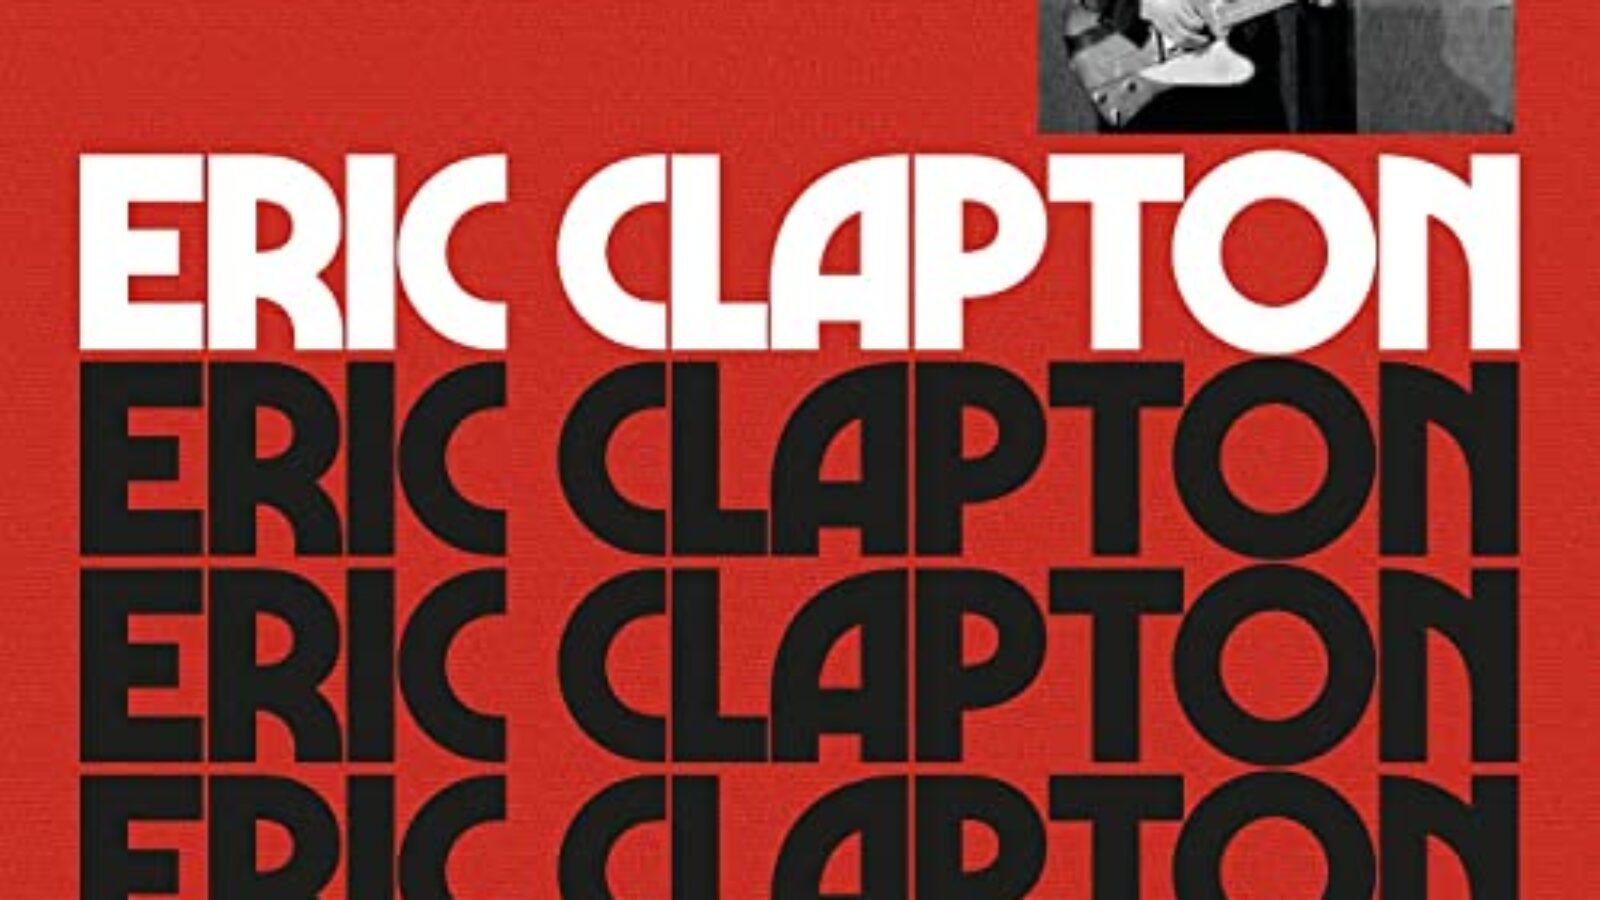 Top 10 CDs – ERIC CLAPTON